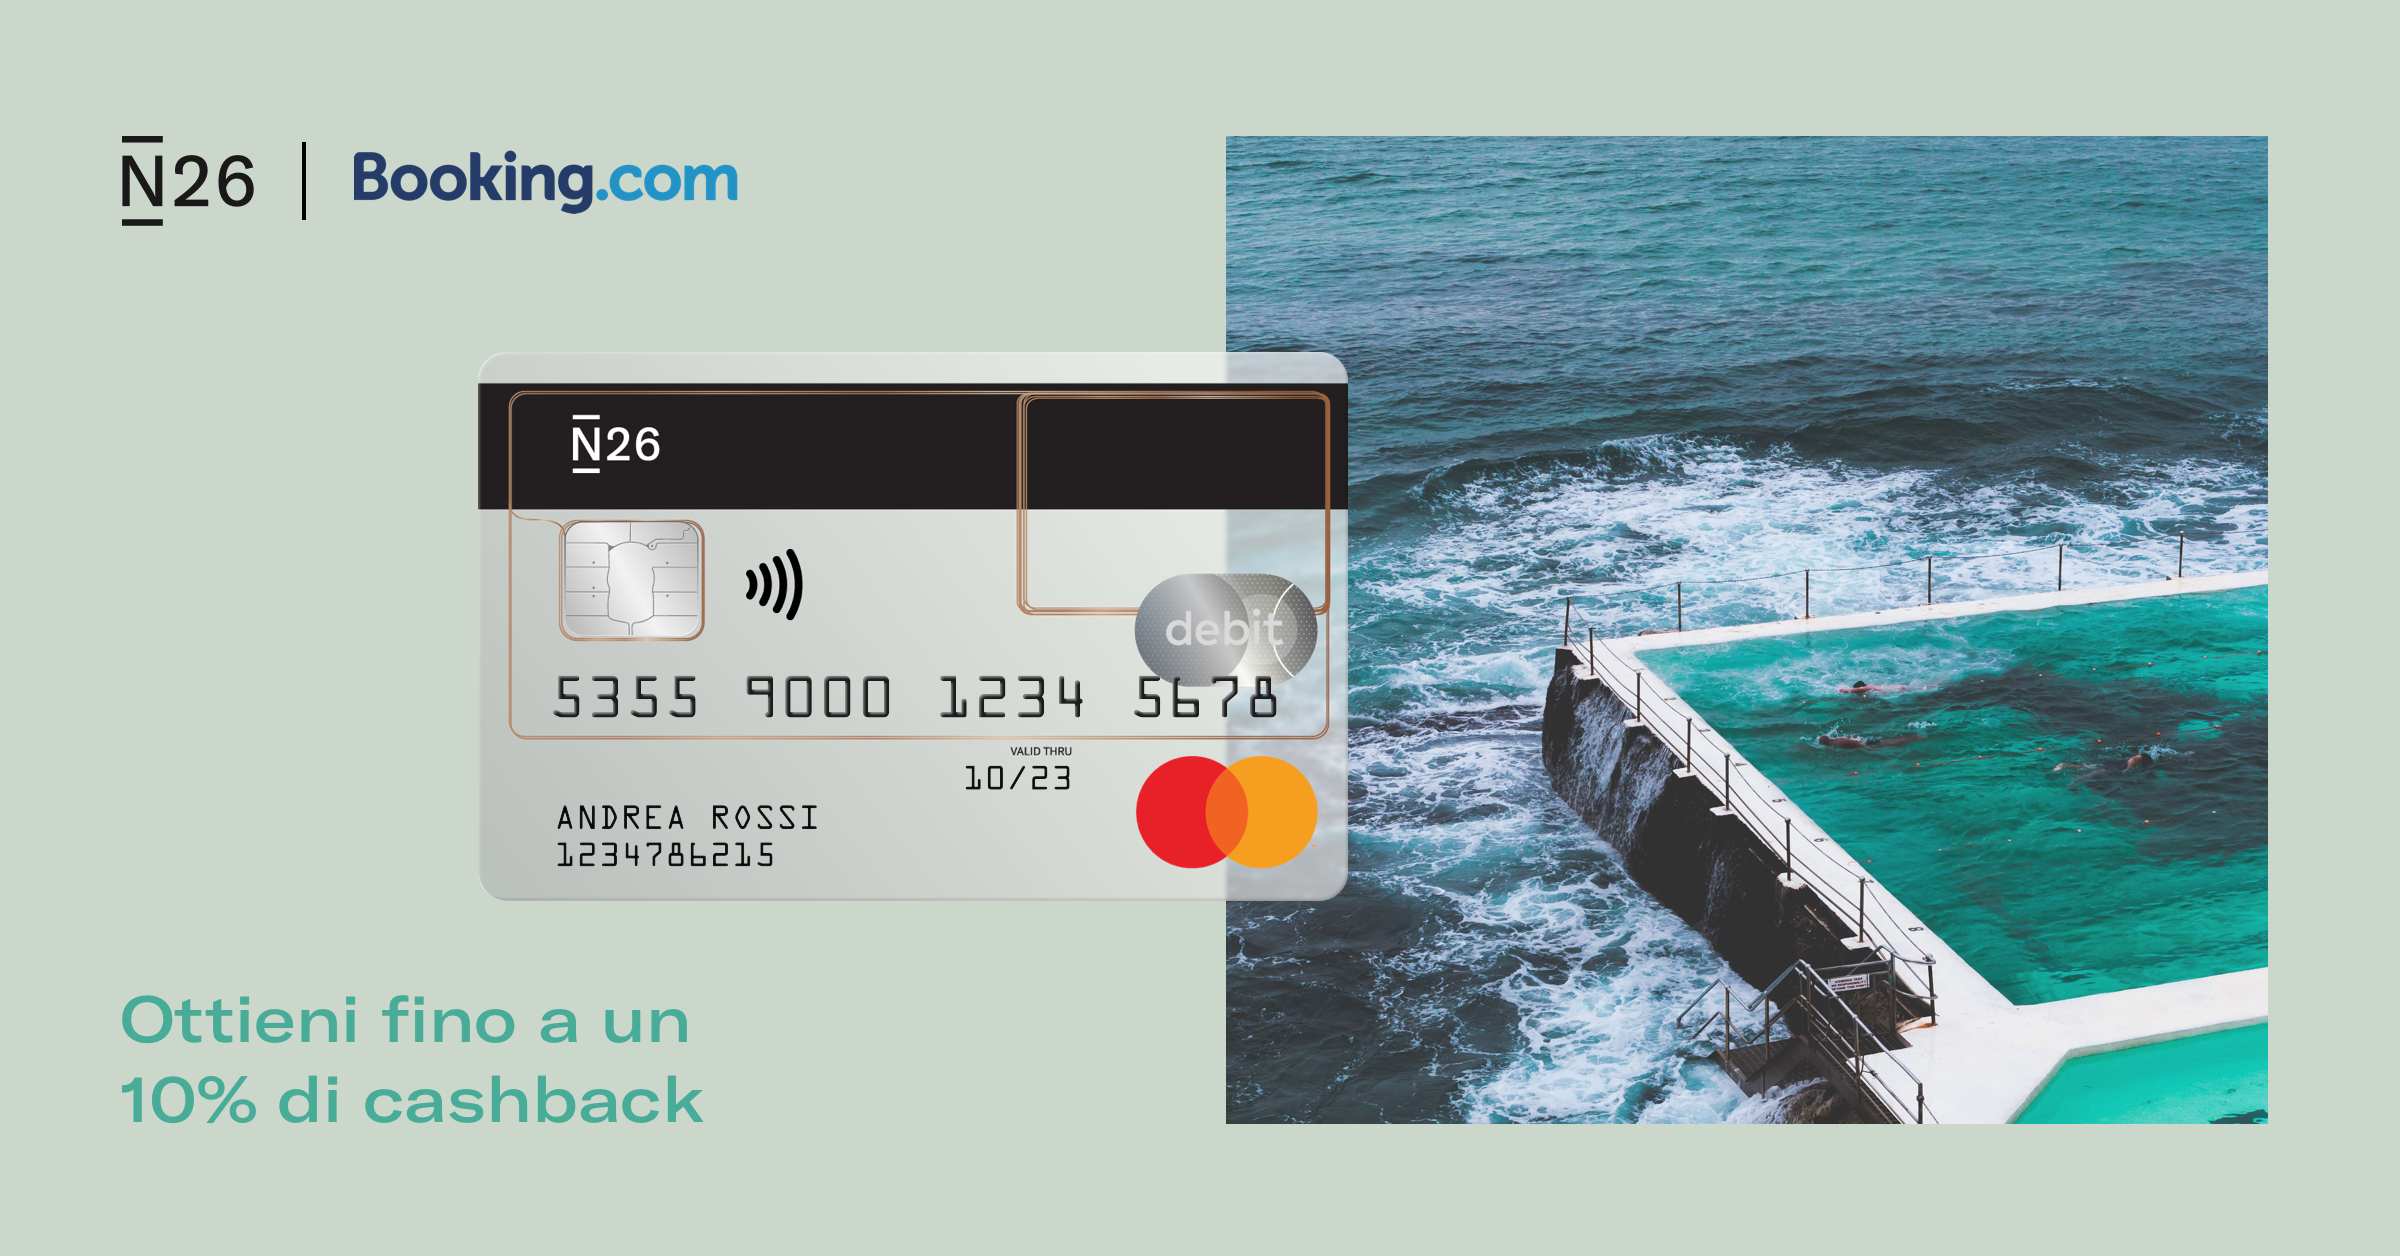 N26 + Booking.com = 10% cashback